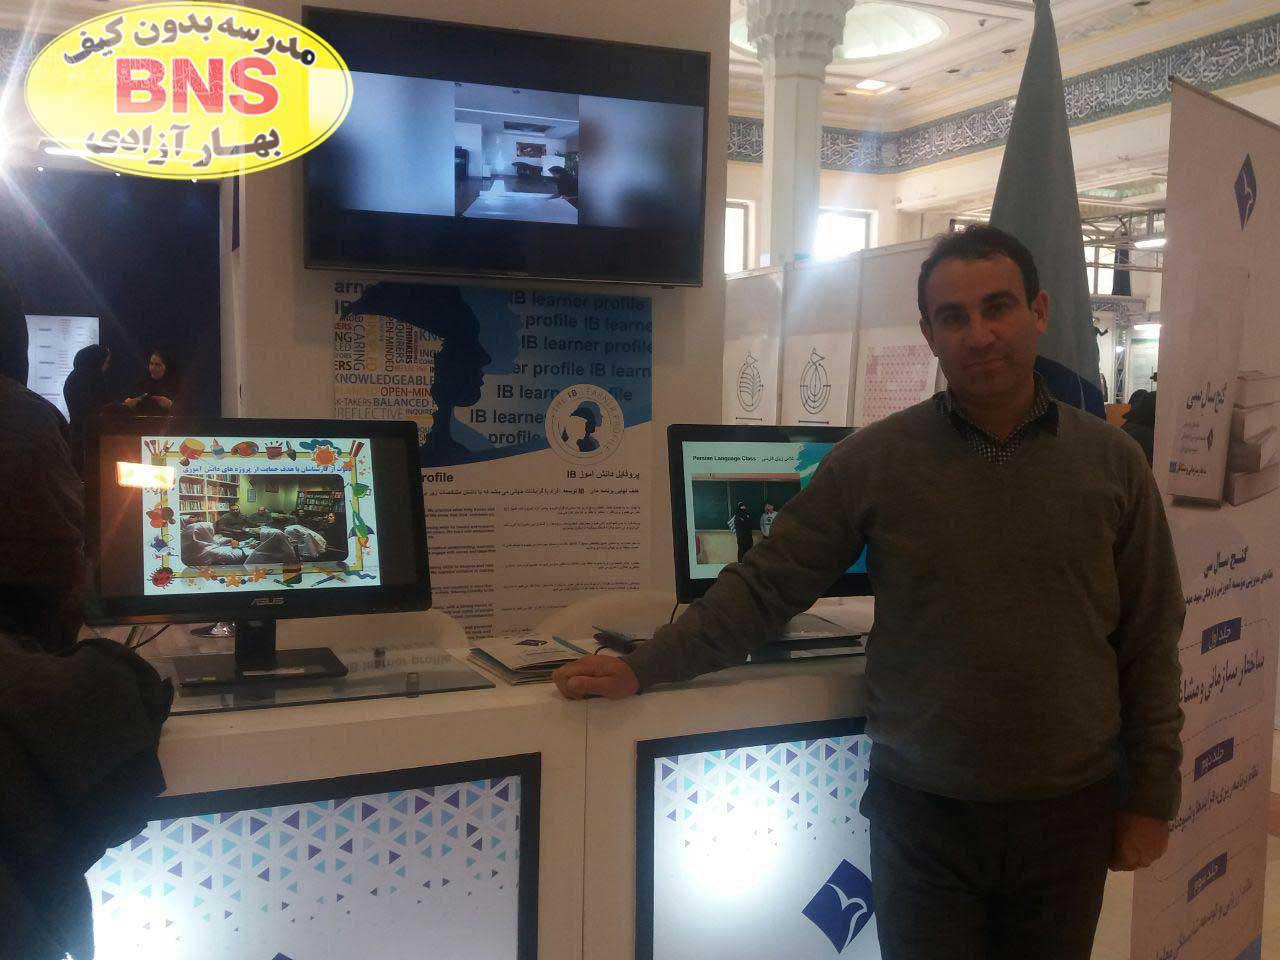 photo 2019 03 01 22 35 05 - نخستین نمایشگاه دستاوردهای مدارس غیر دولتی در تهران